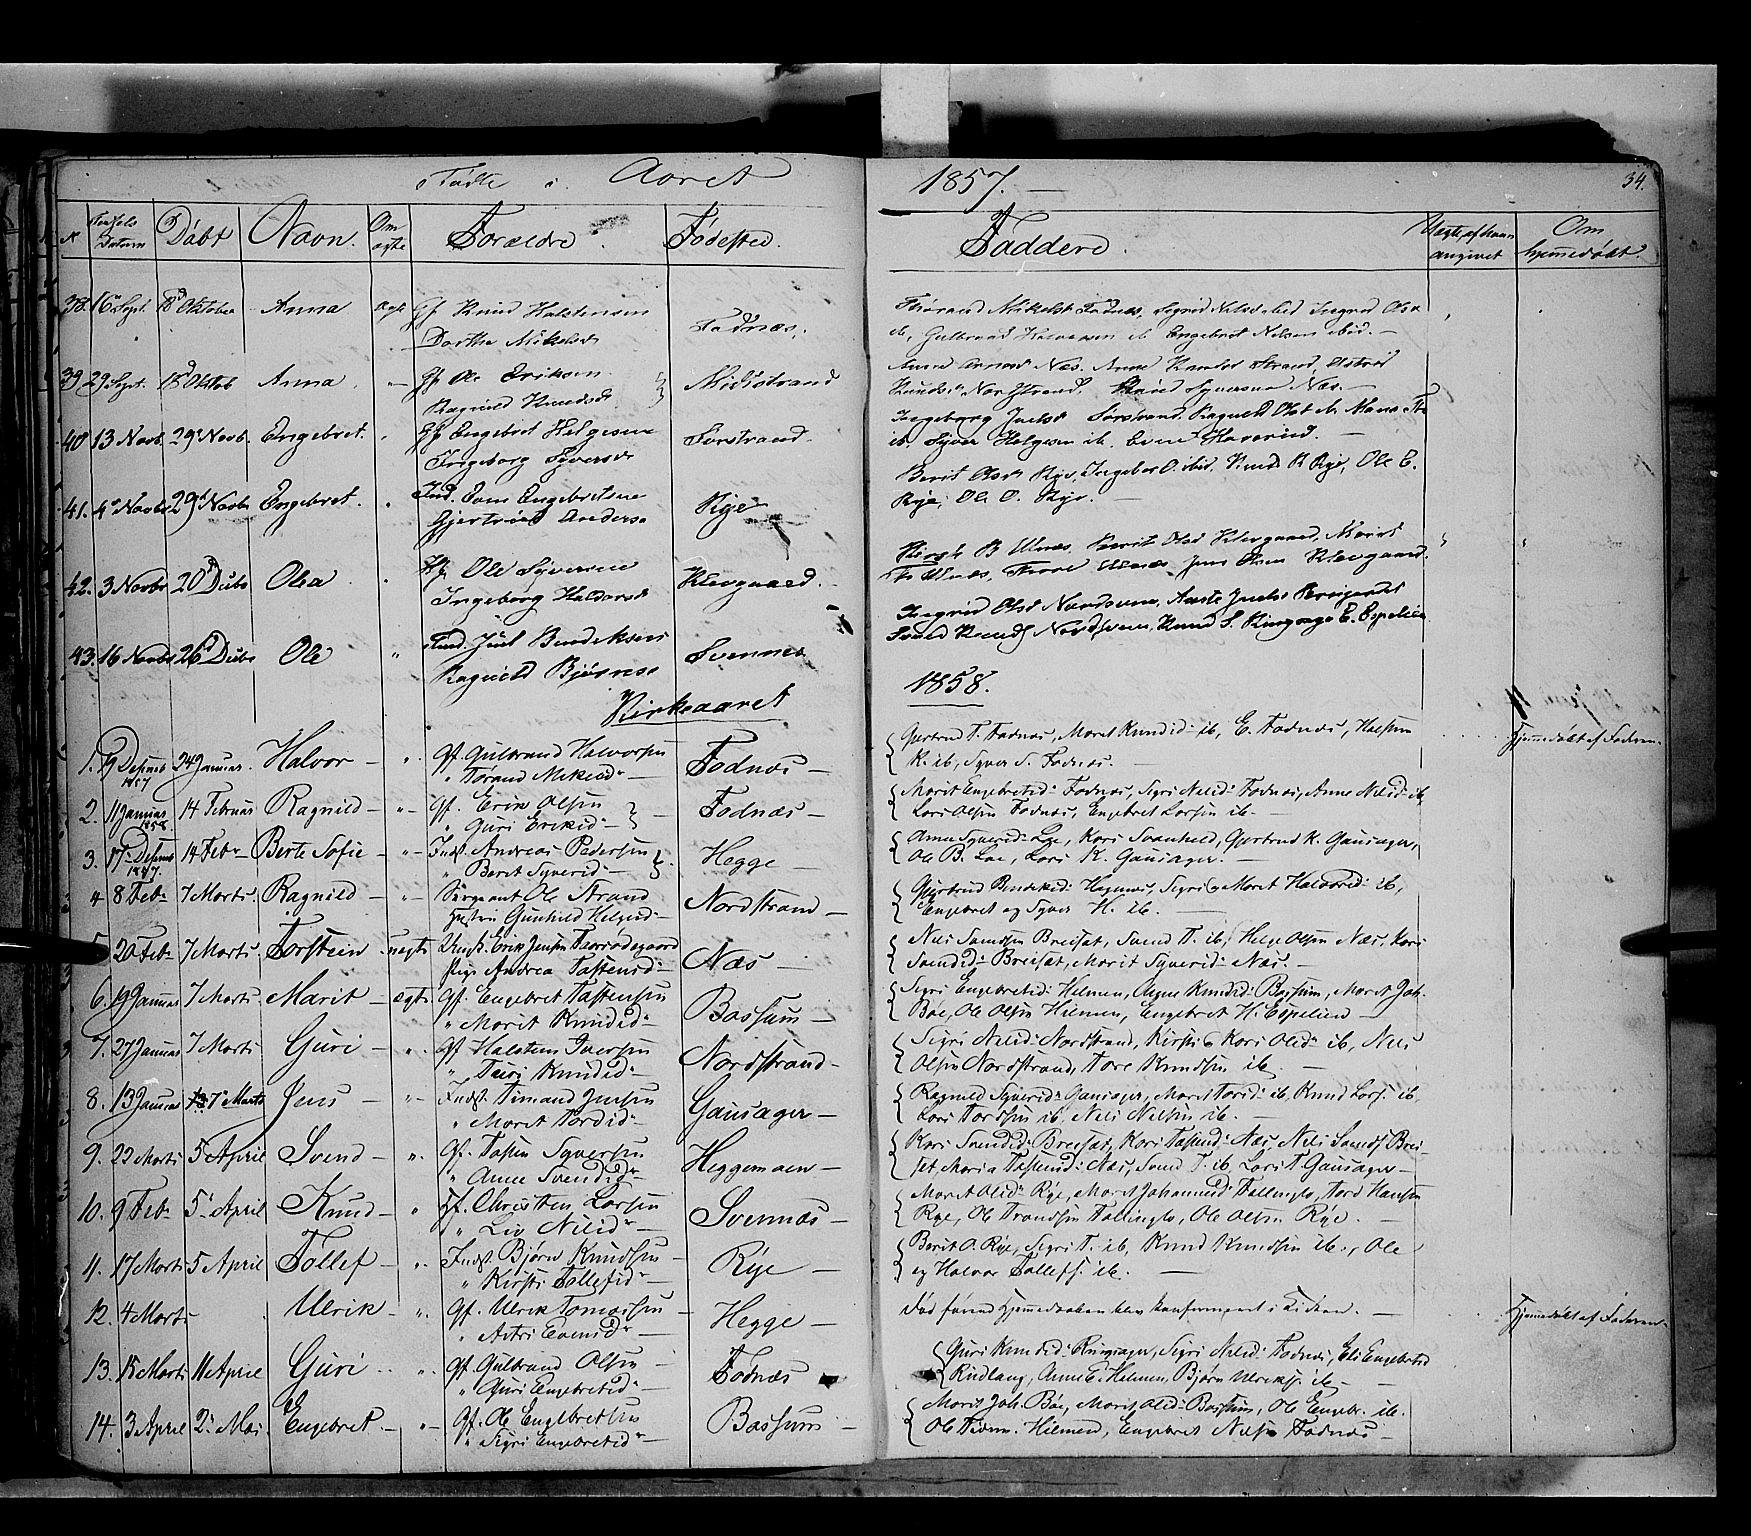 SAH, Nord-Aurdal prestekontor, Ministerialbok nr. 5, 1842-1863, s. 34